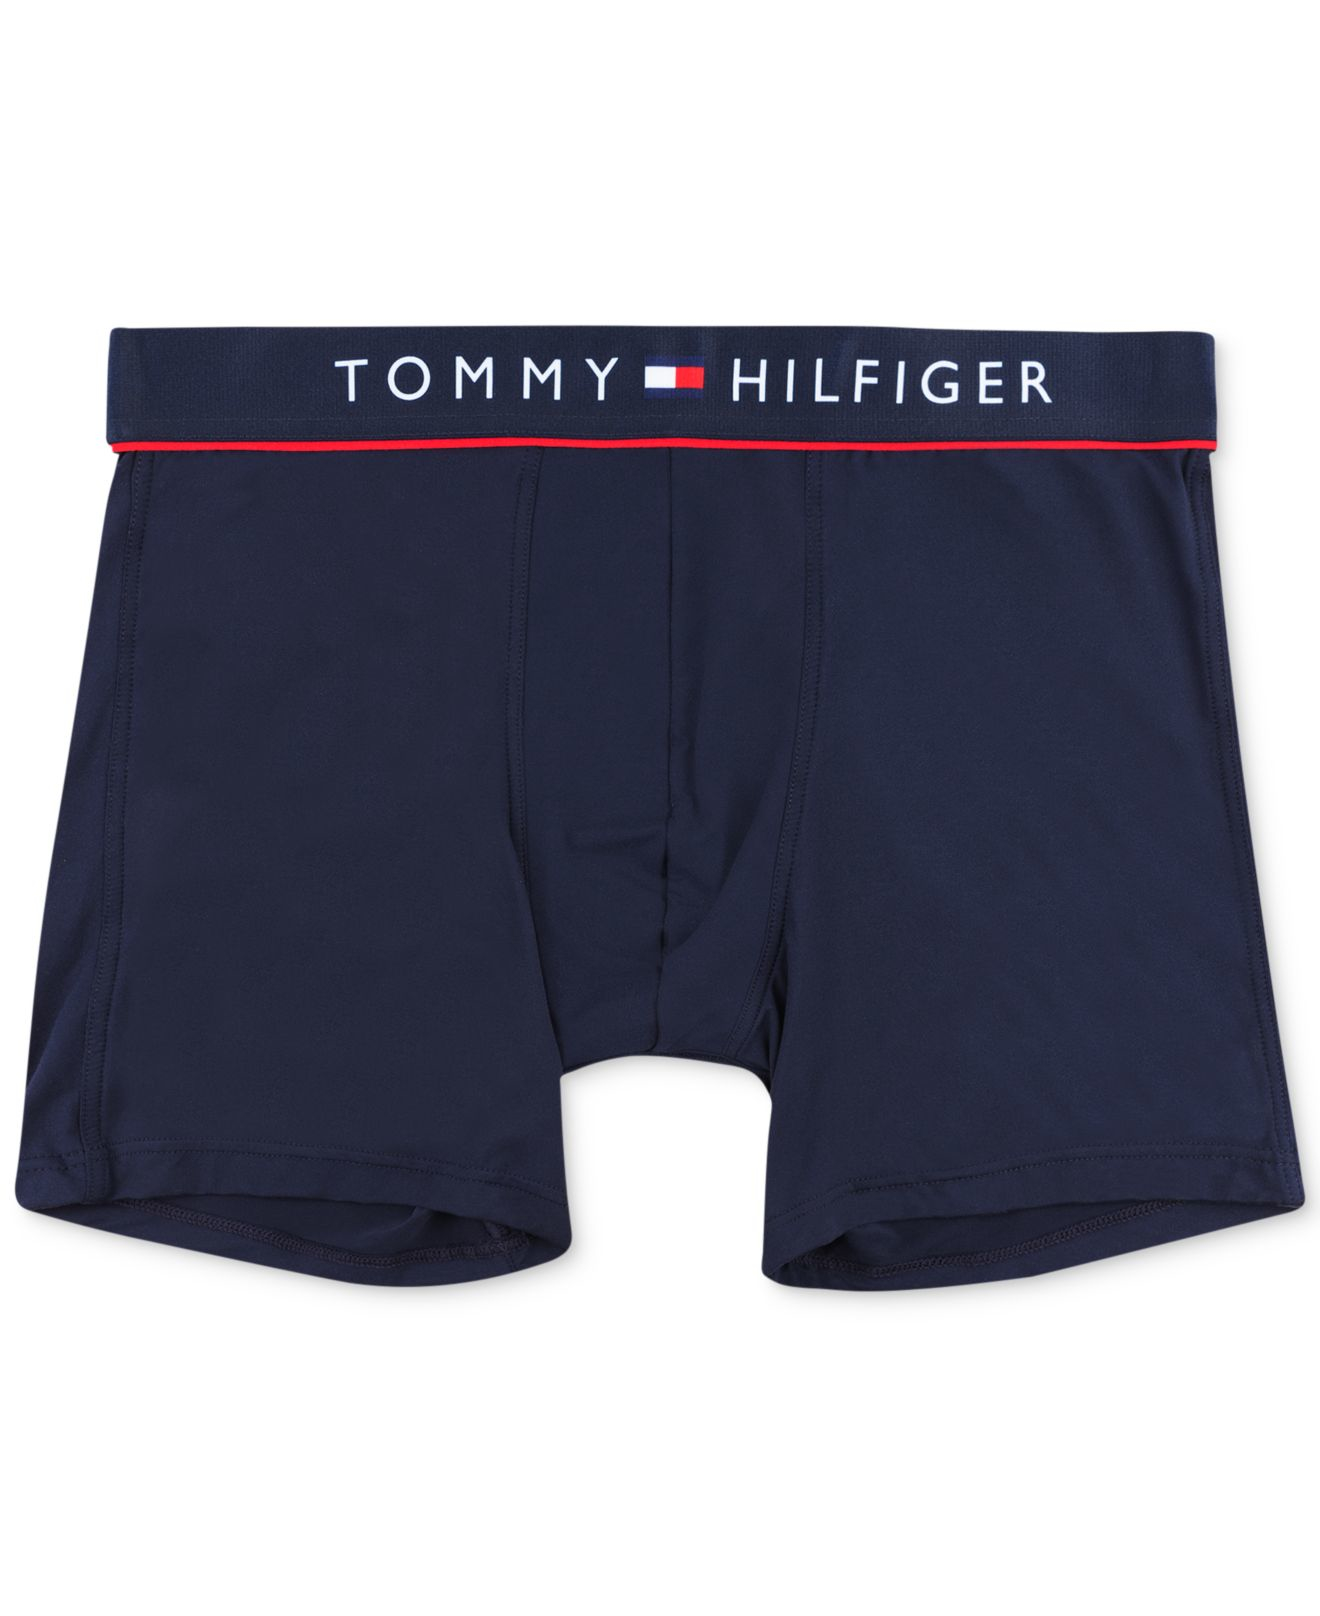 tommy hilfiger micro flex boxer briefs in blue for men dark navy. Black Bedroom Furniture Sets. Home Design Ideas